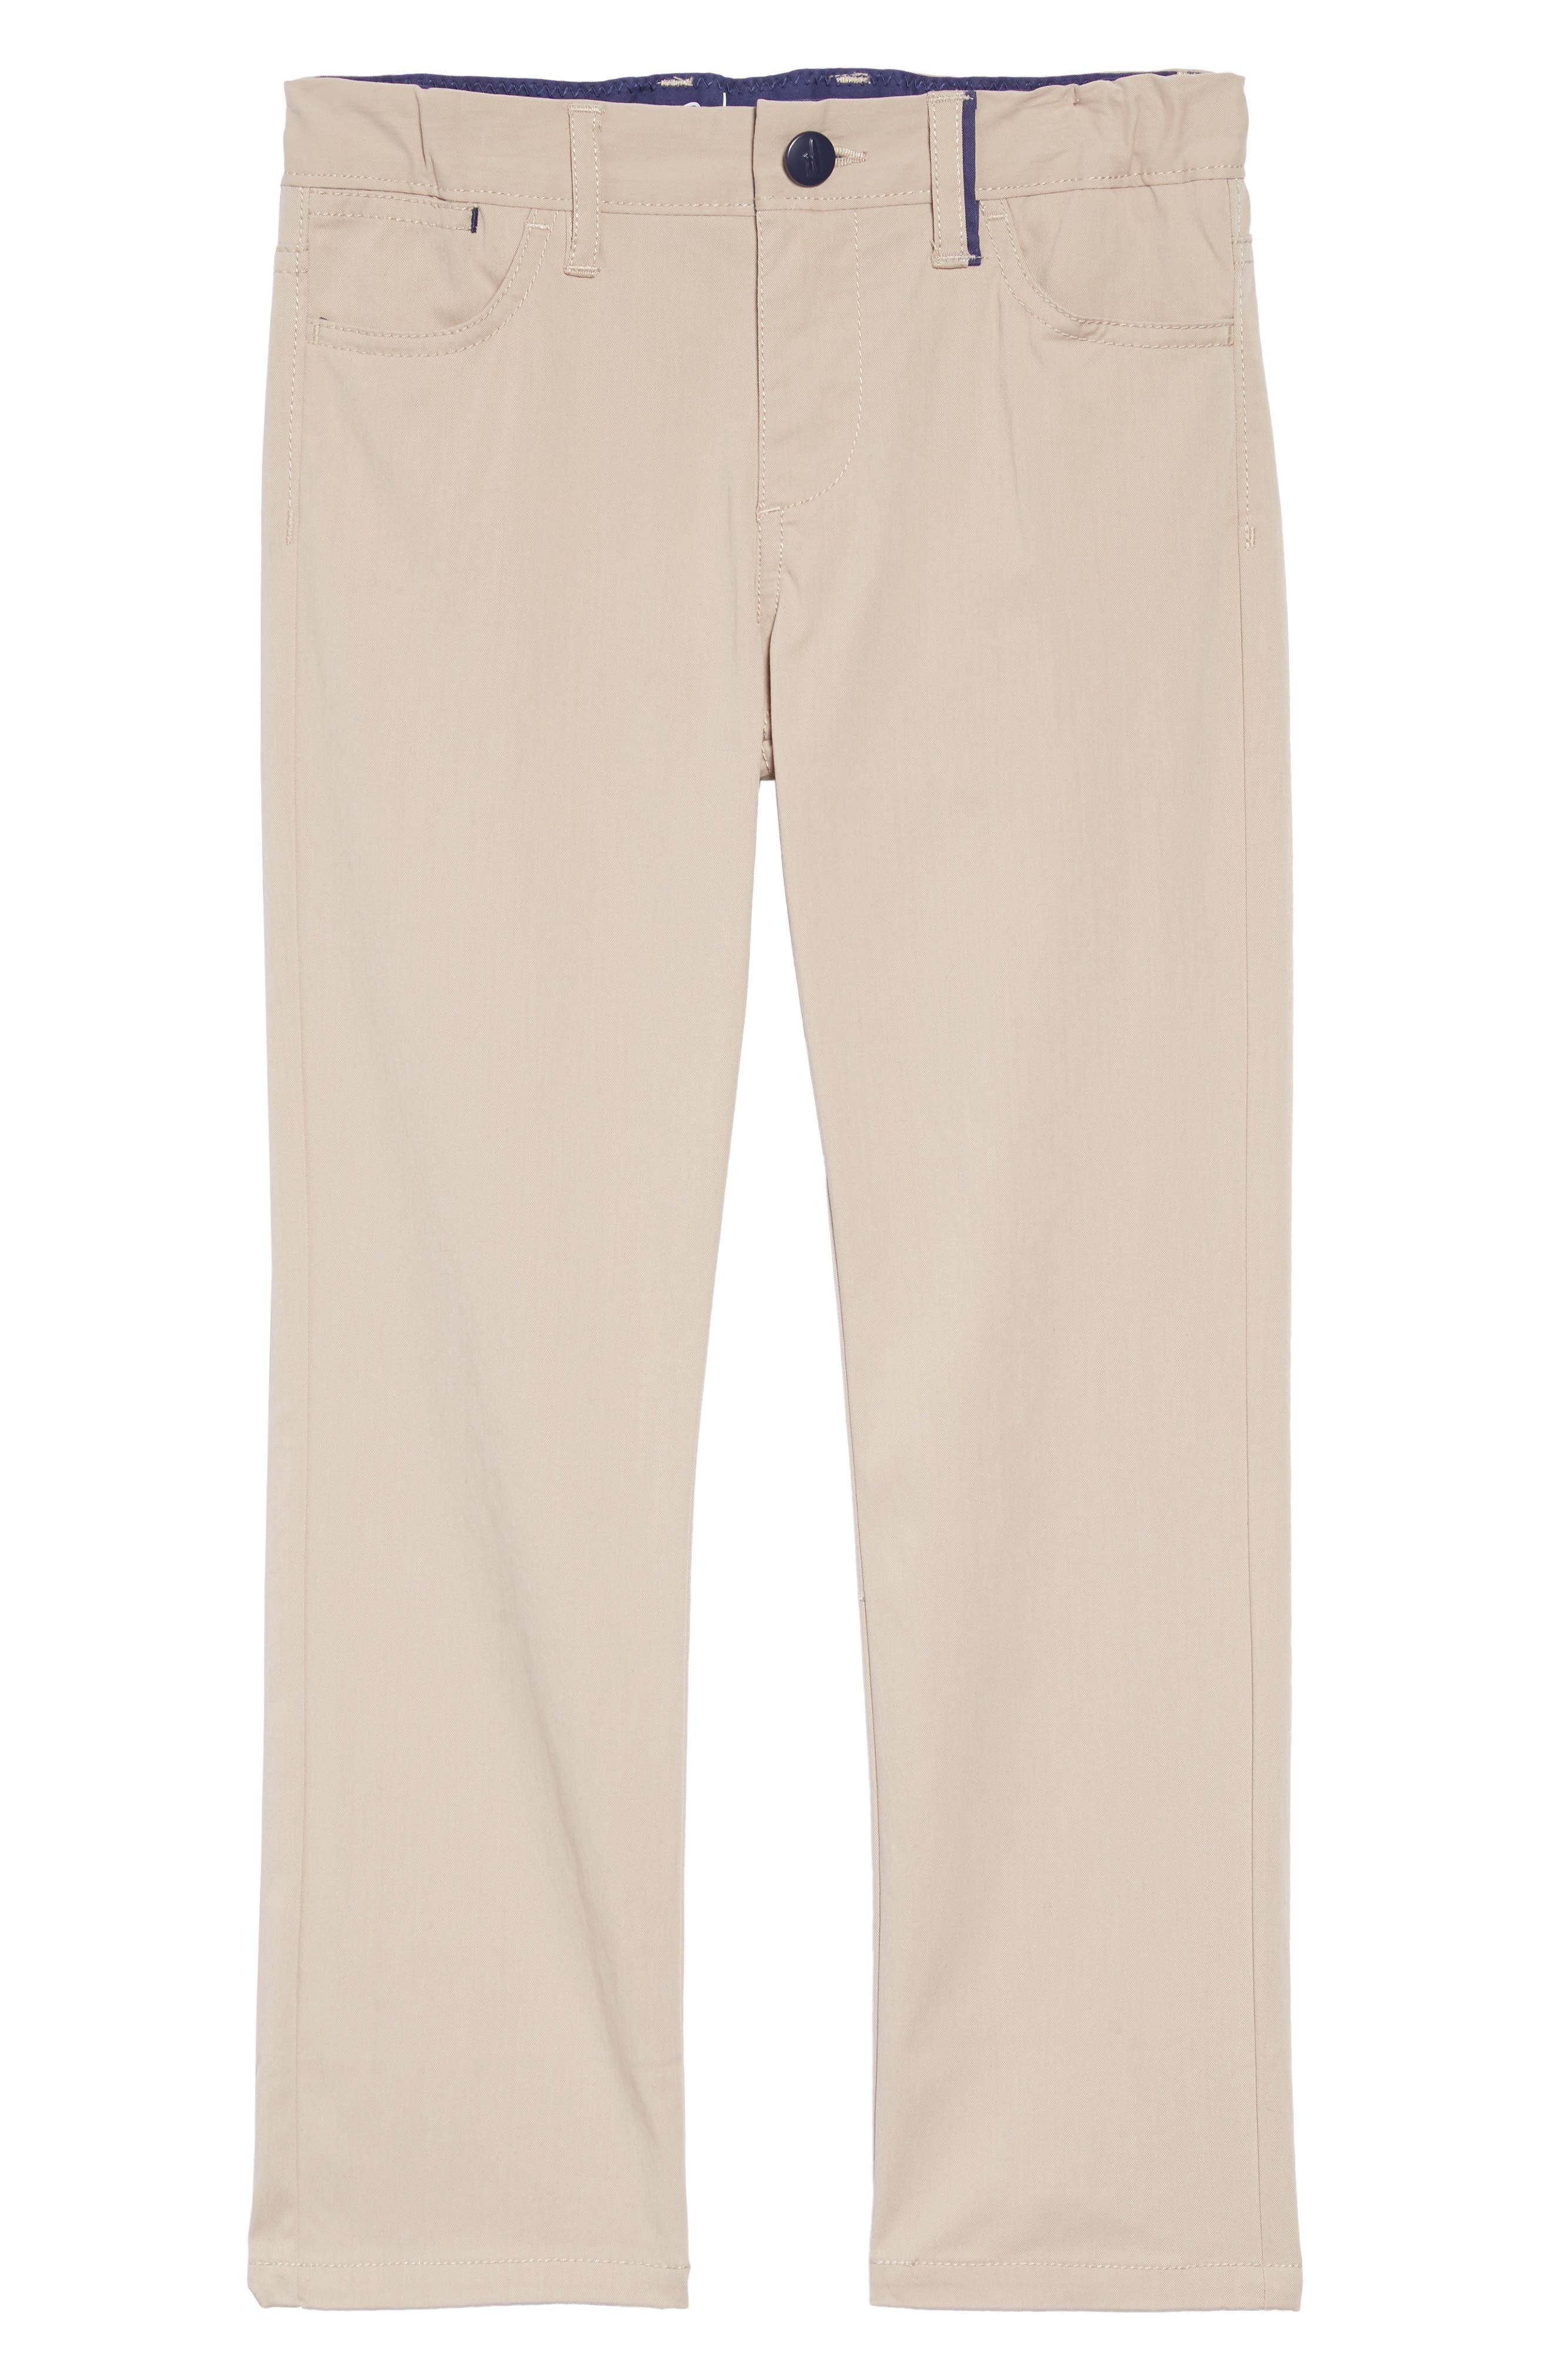 Marin Pants,                         Main,                         color, LIGHT KHAKI